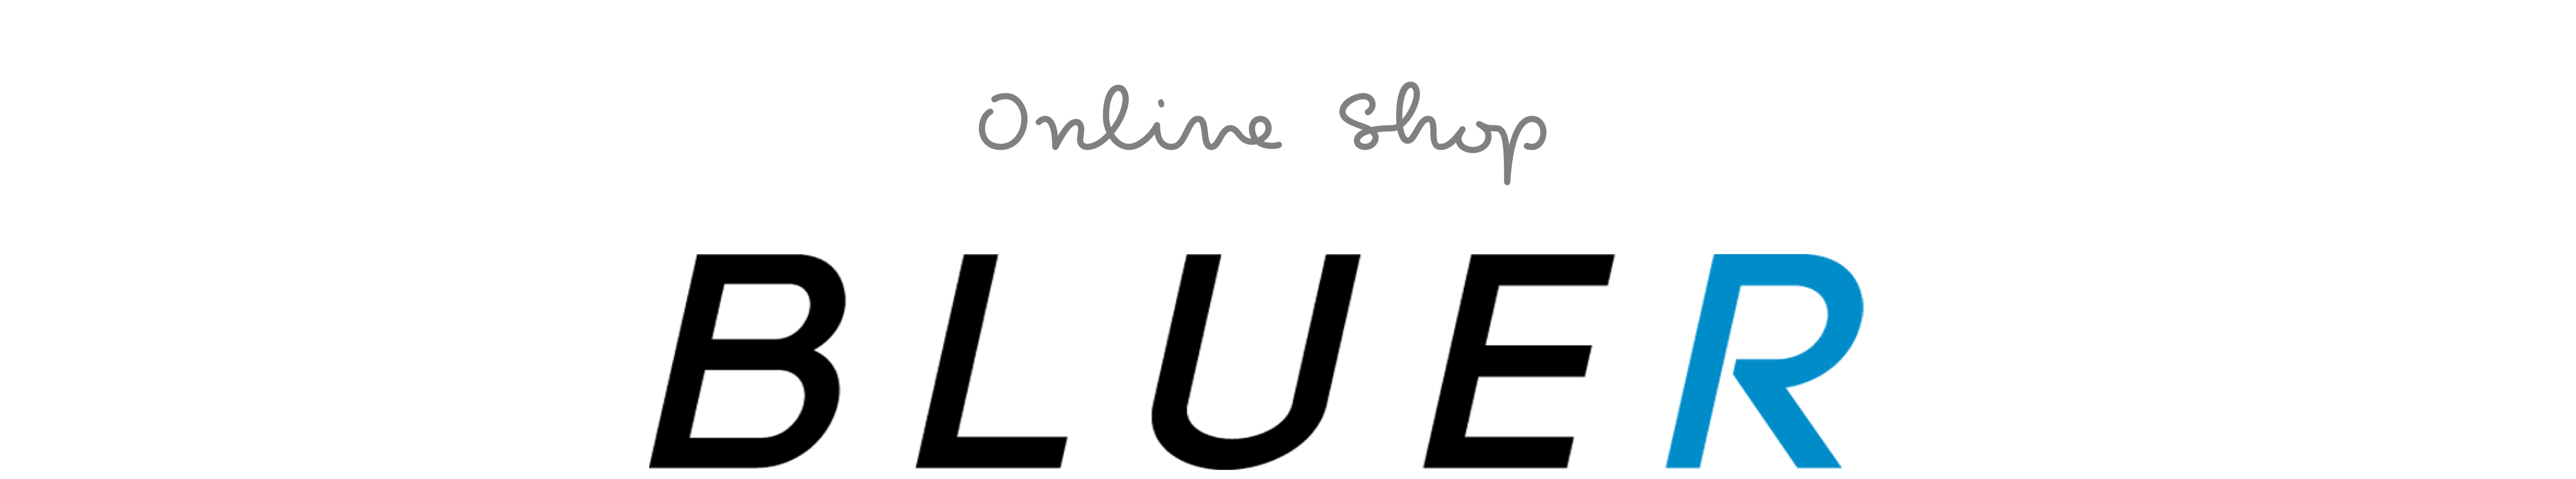 BLUER ONLINE SHOP|ブルアーオンラインショップ